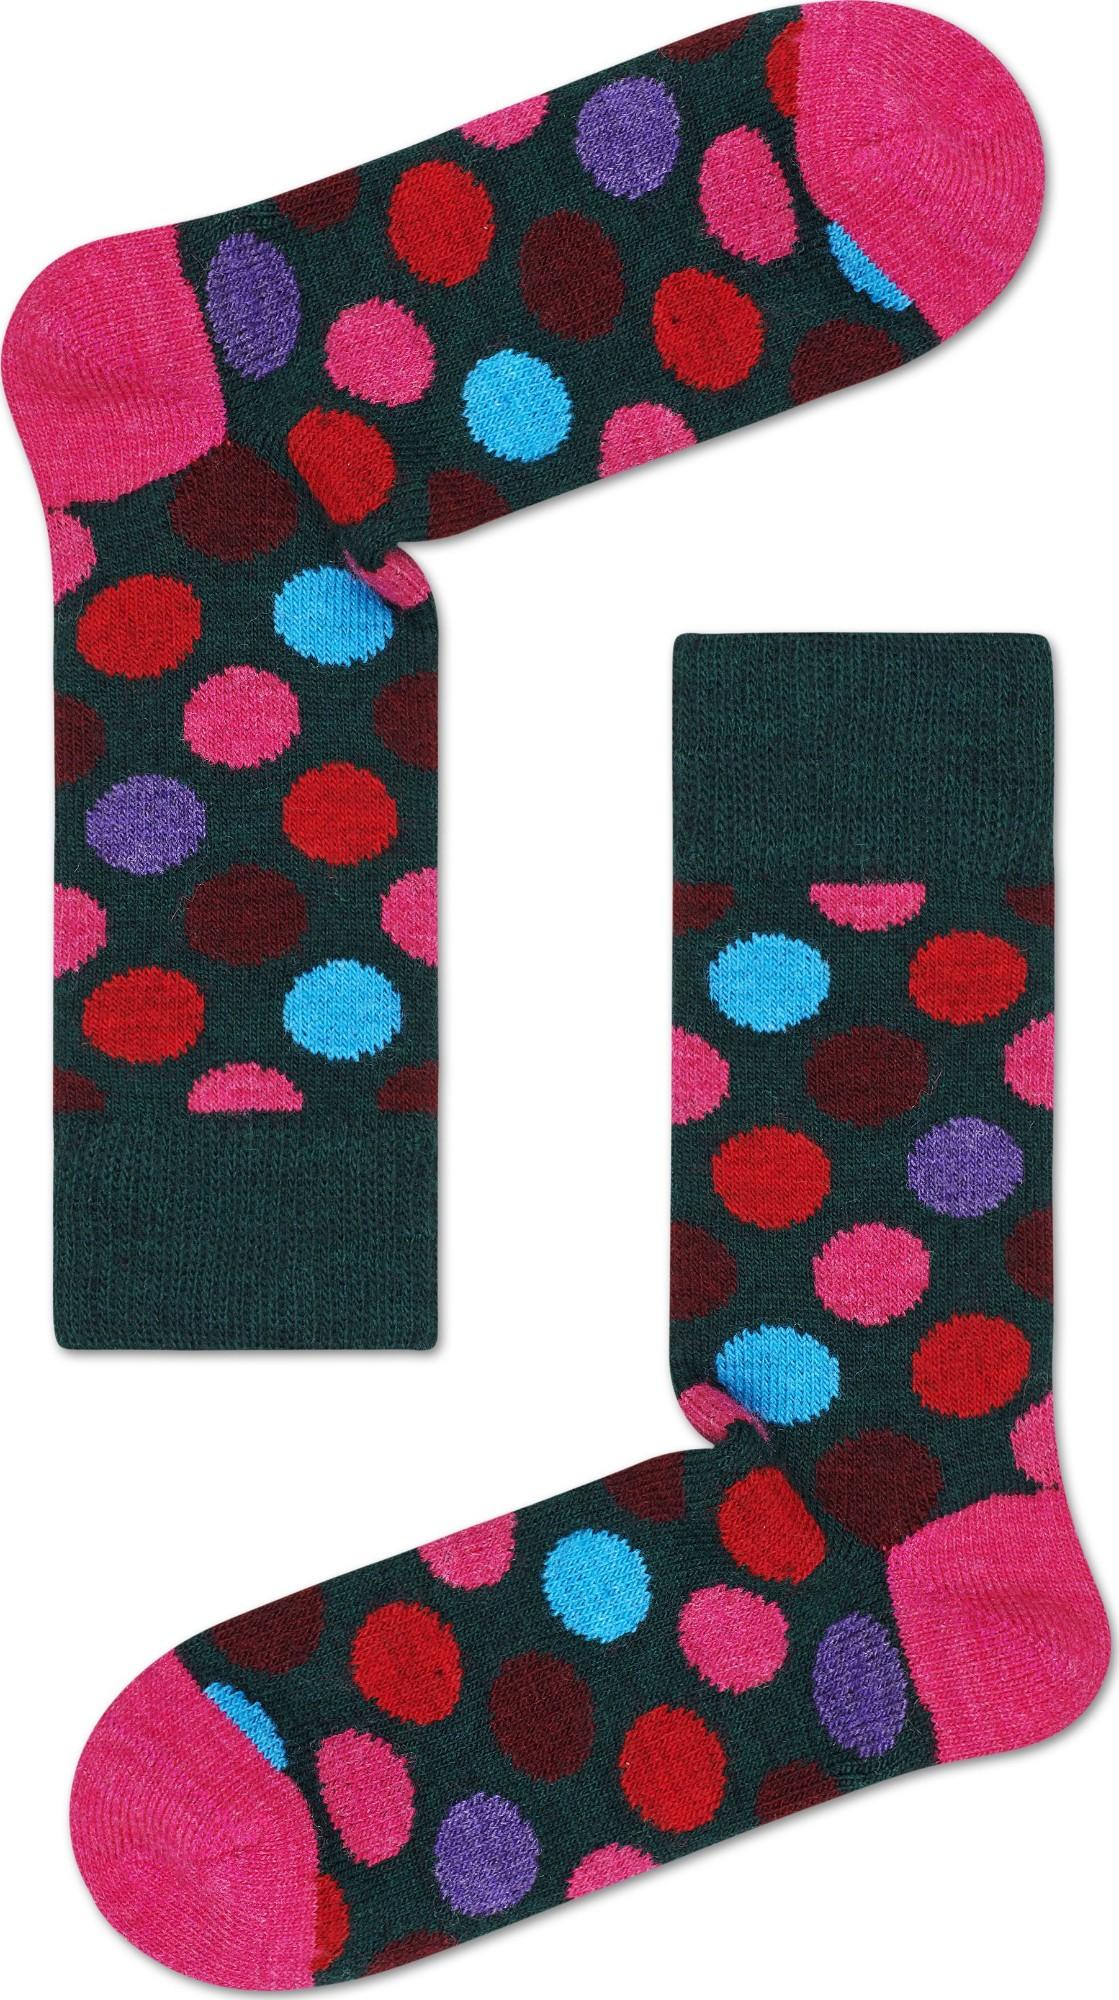 Happy Socks Wool Big Dot Multi 7300 36-40